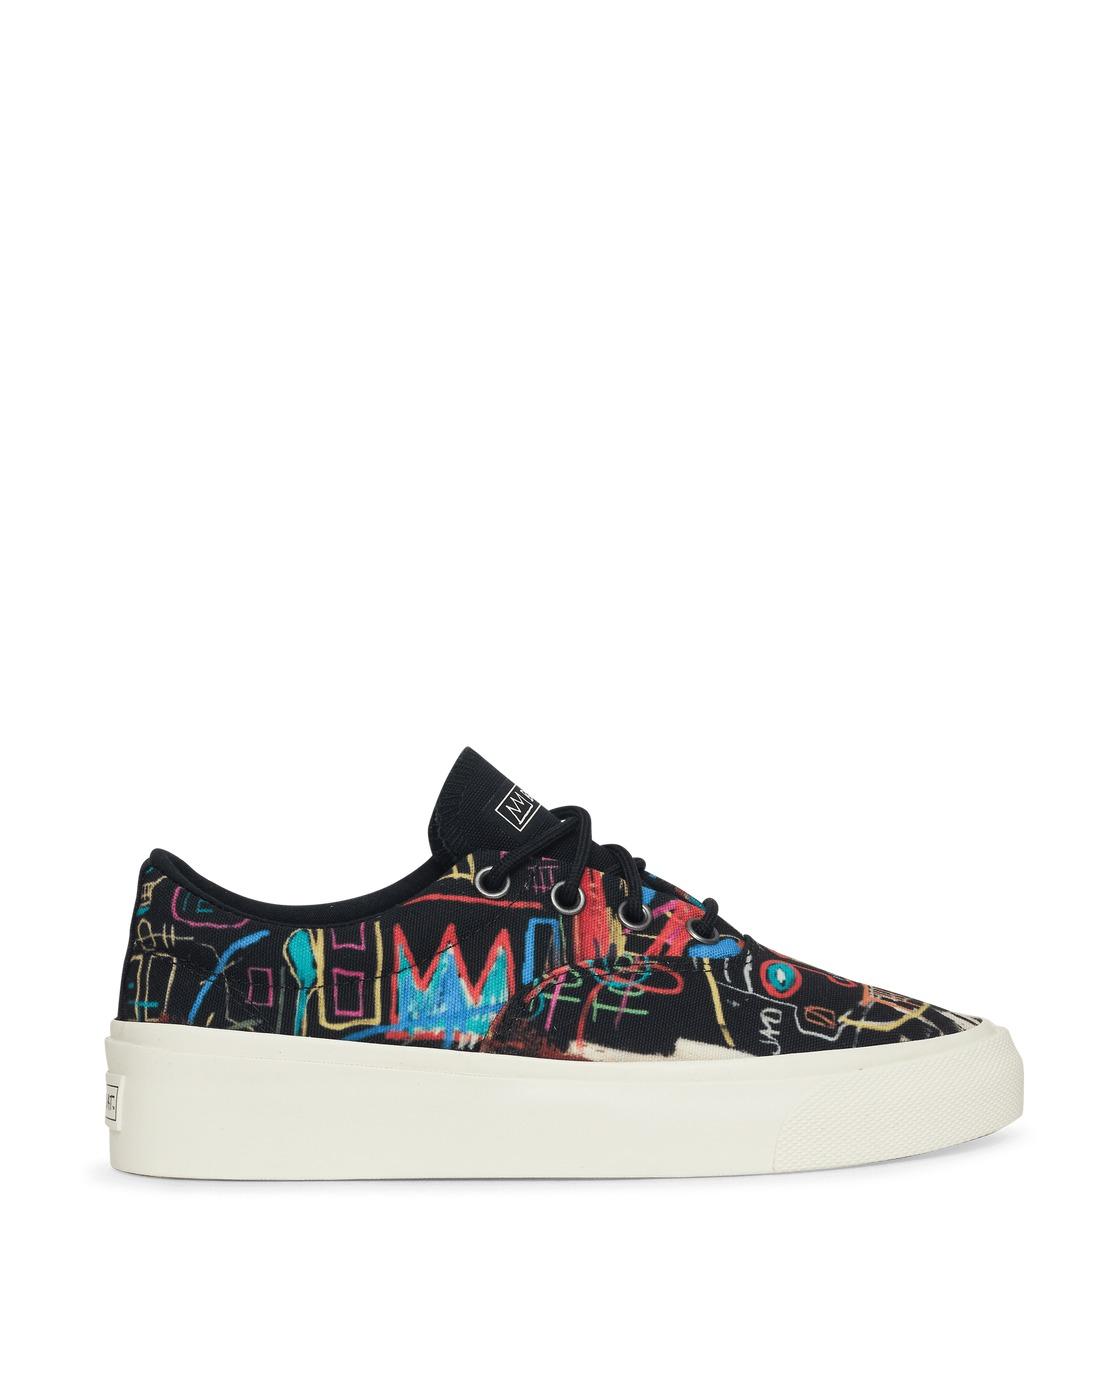 Photo: Converse Basquiat Skidgrip Sneakers Black/Multi